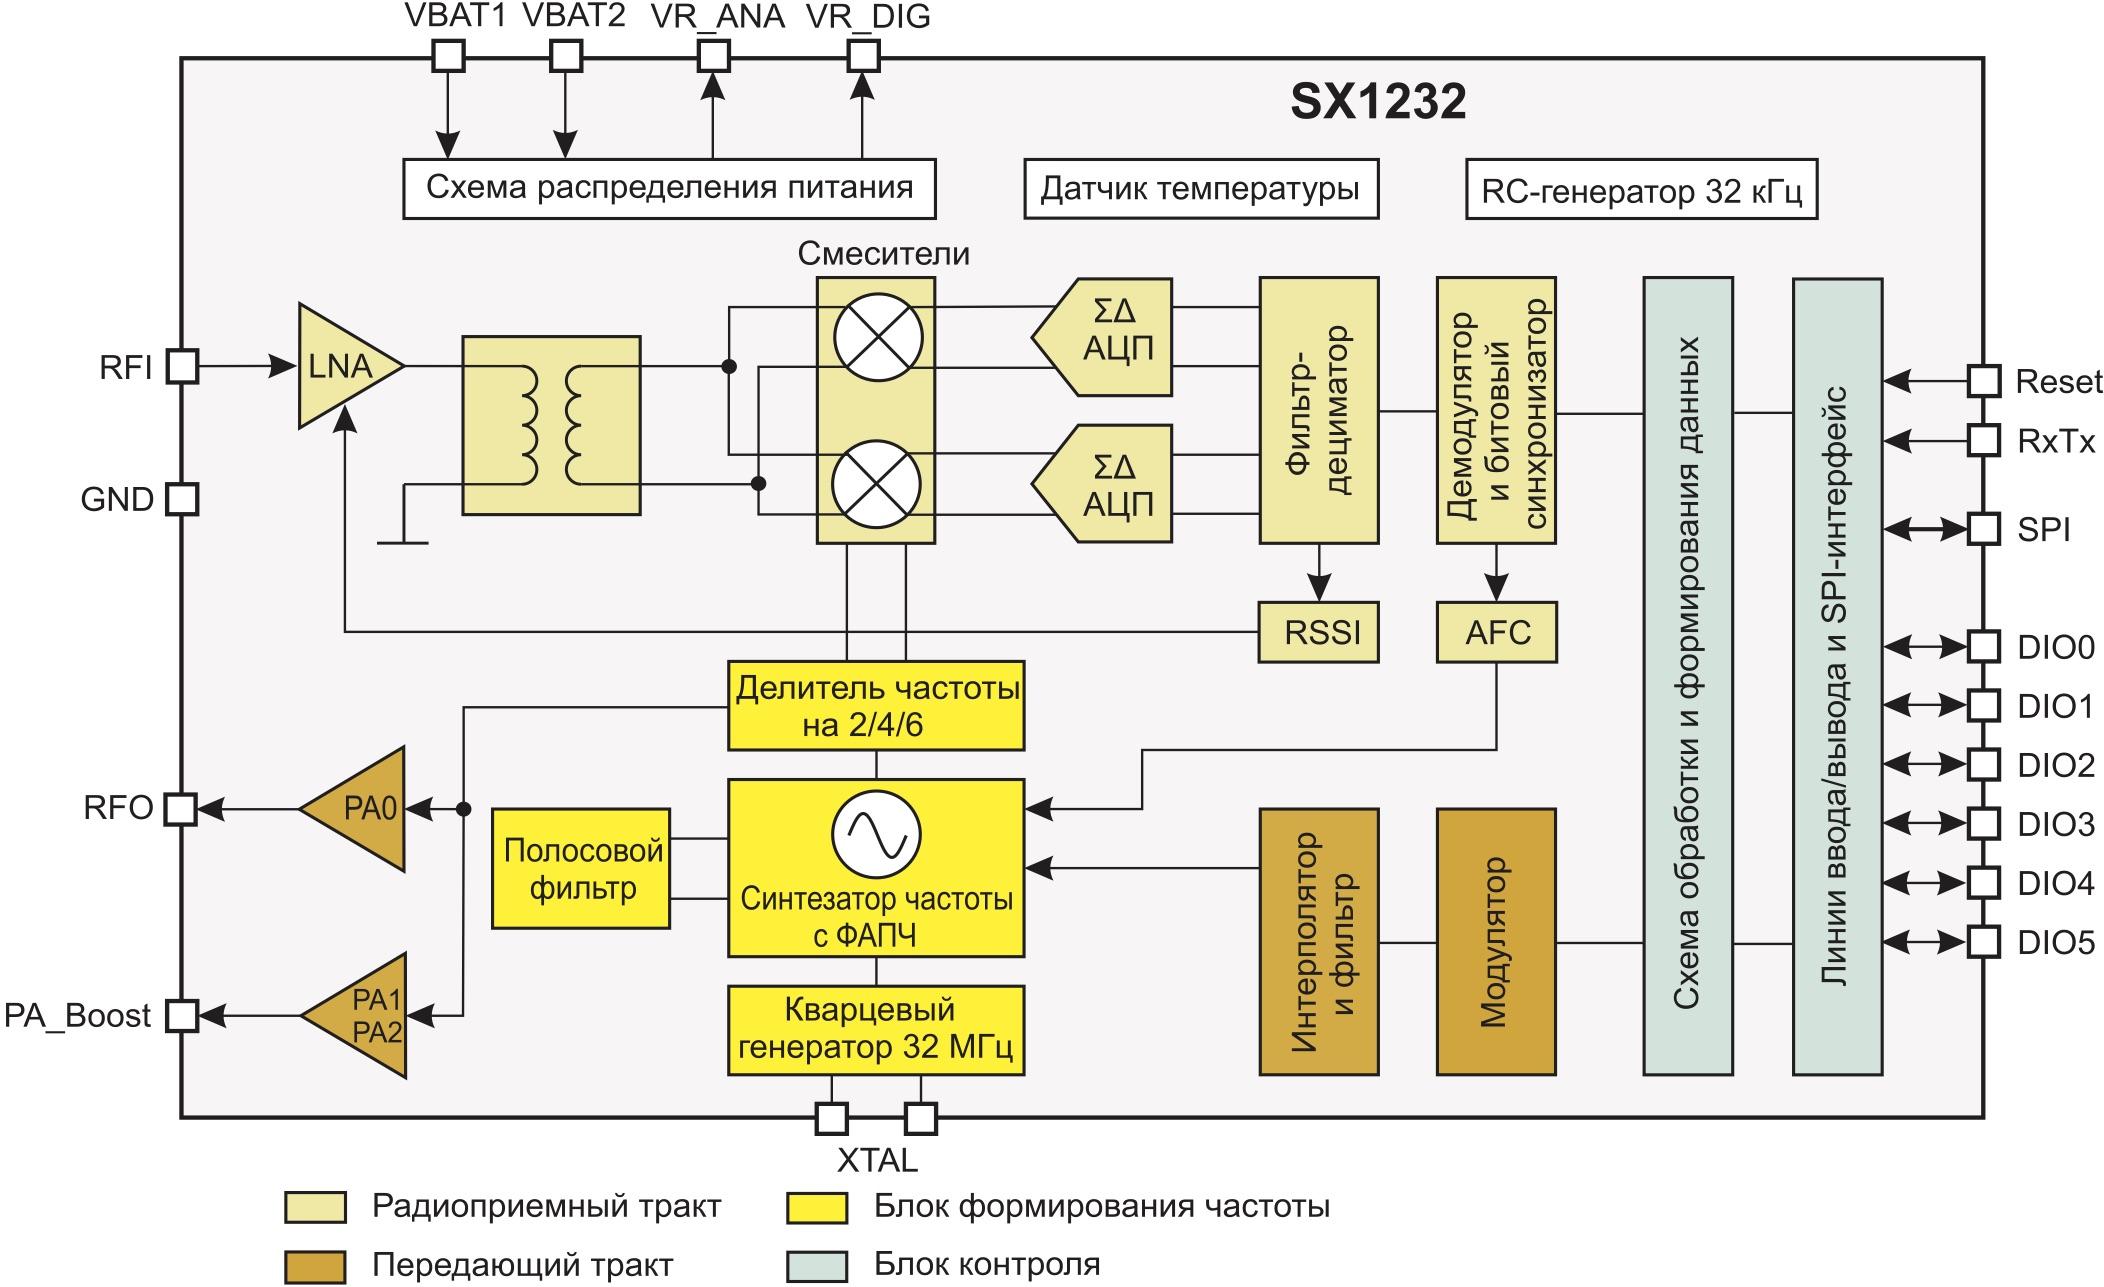 Внутренняя структура трансивера SX1232